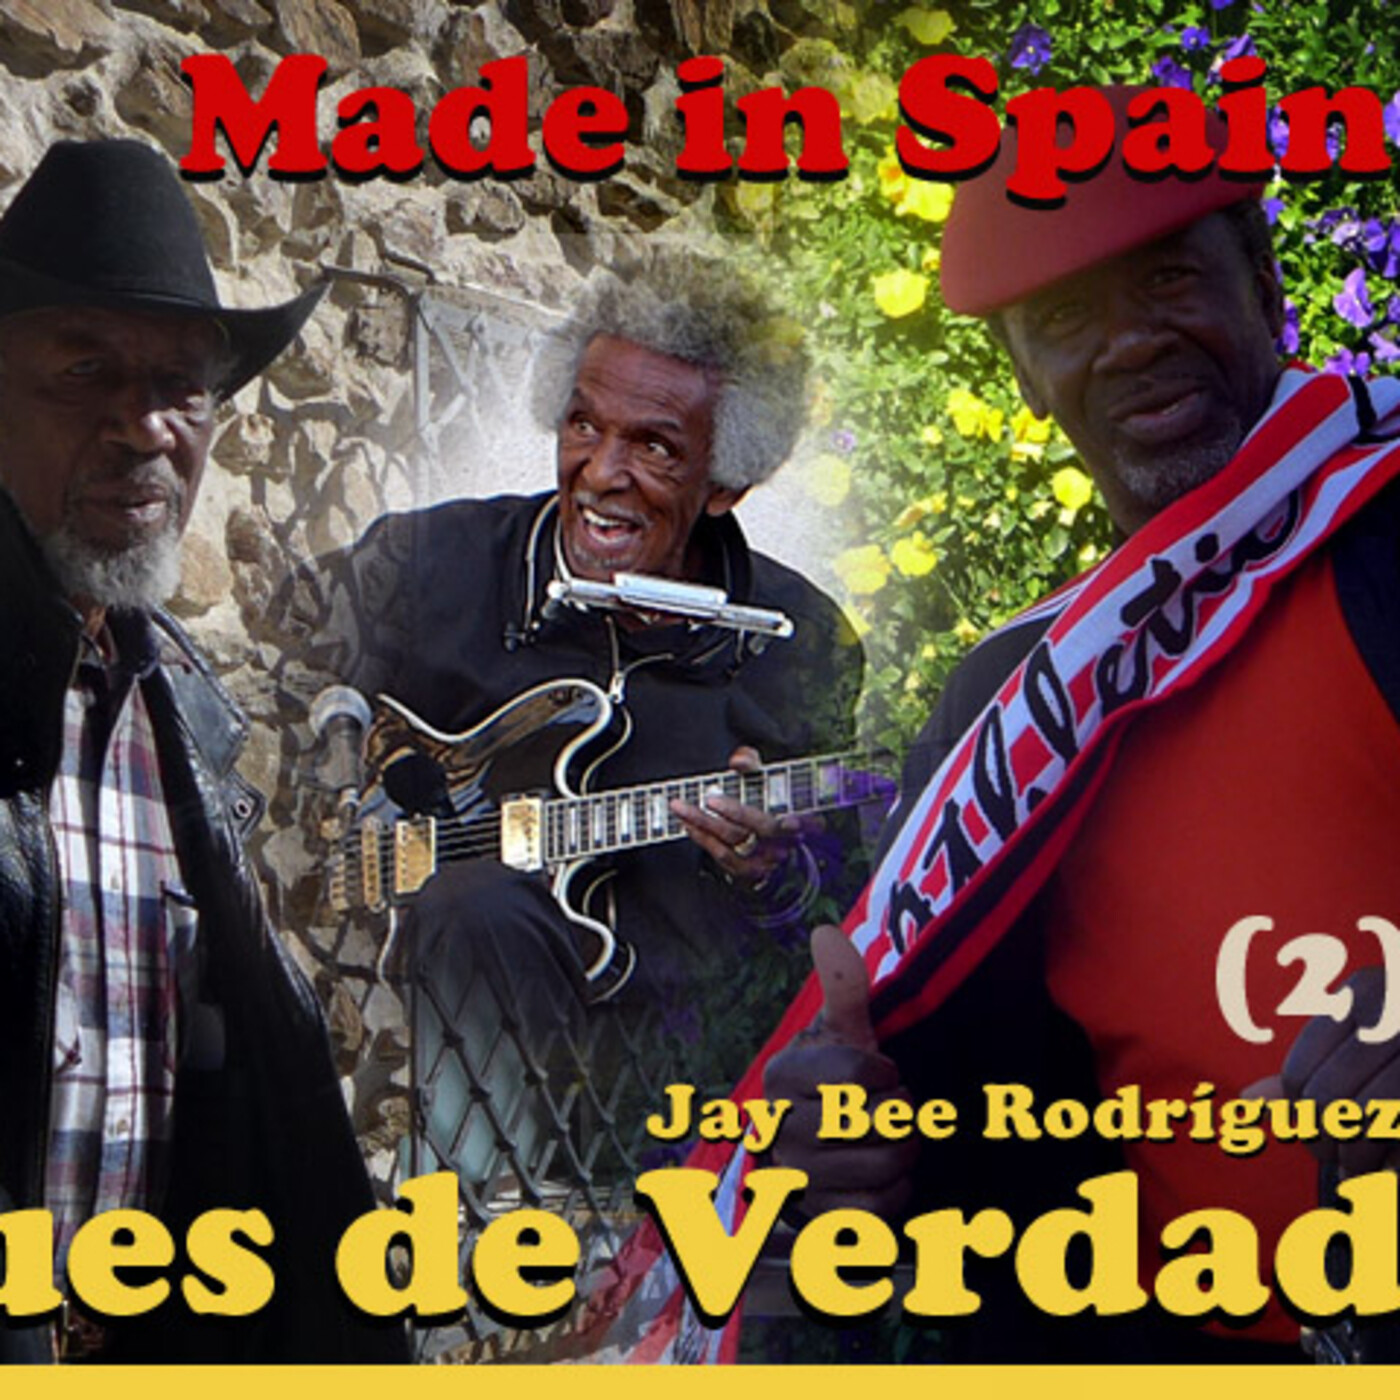 Blues de Verdad - podcast 43: Made in Spain (parte 2)